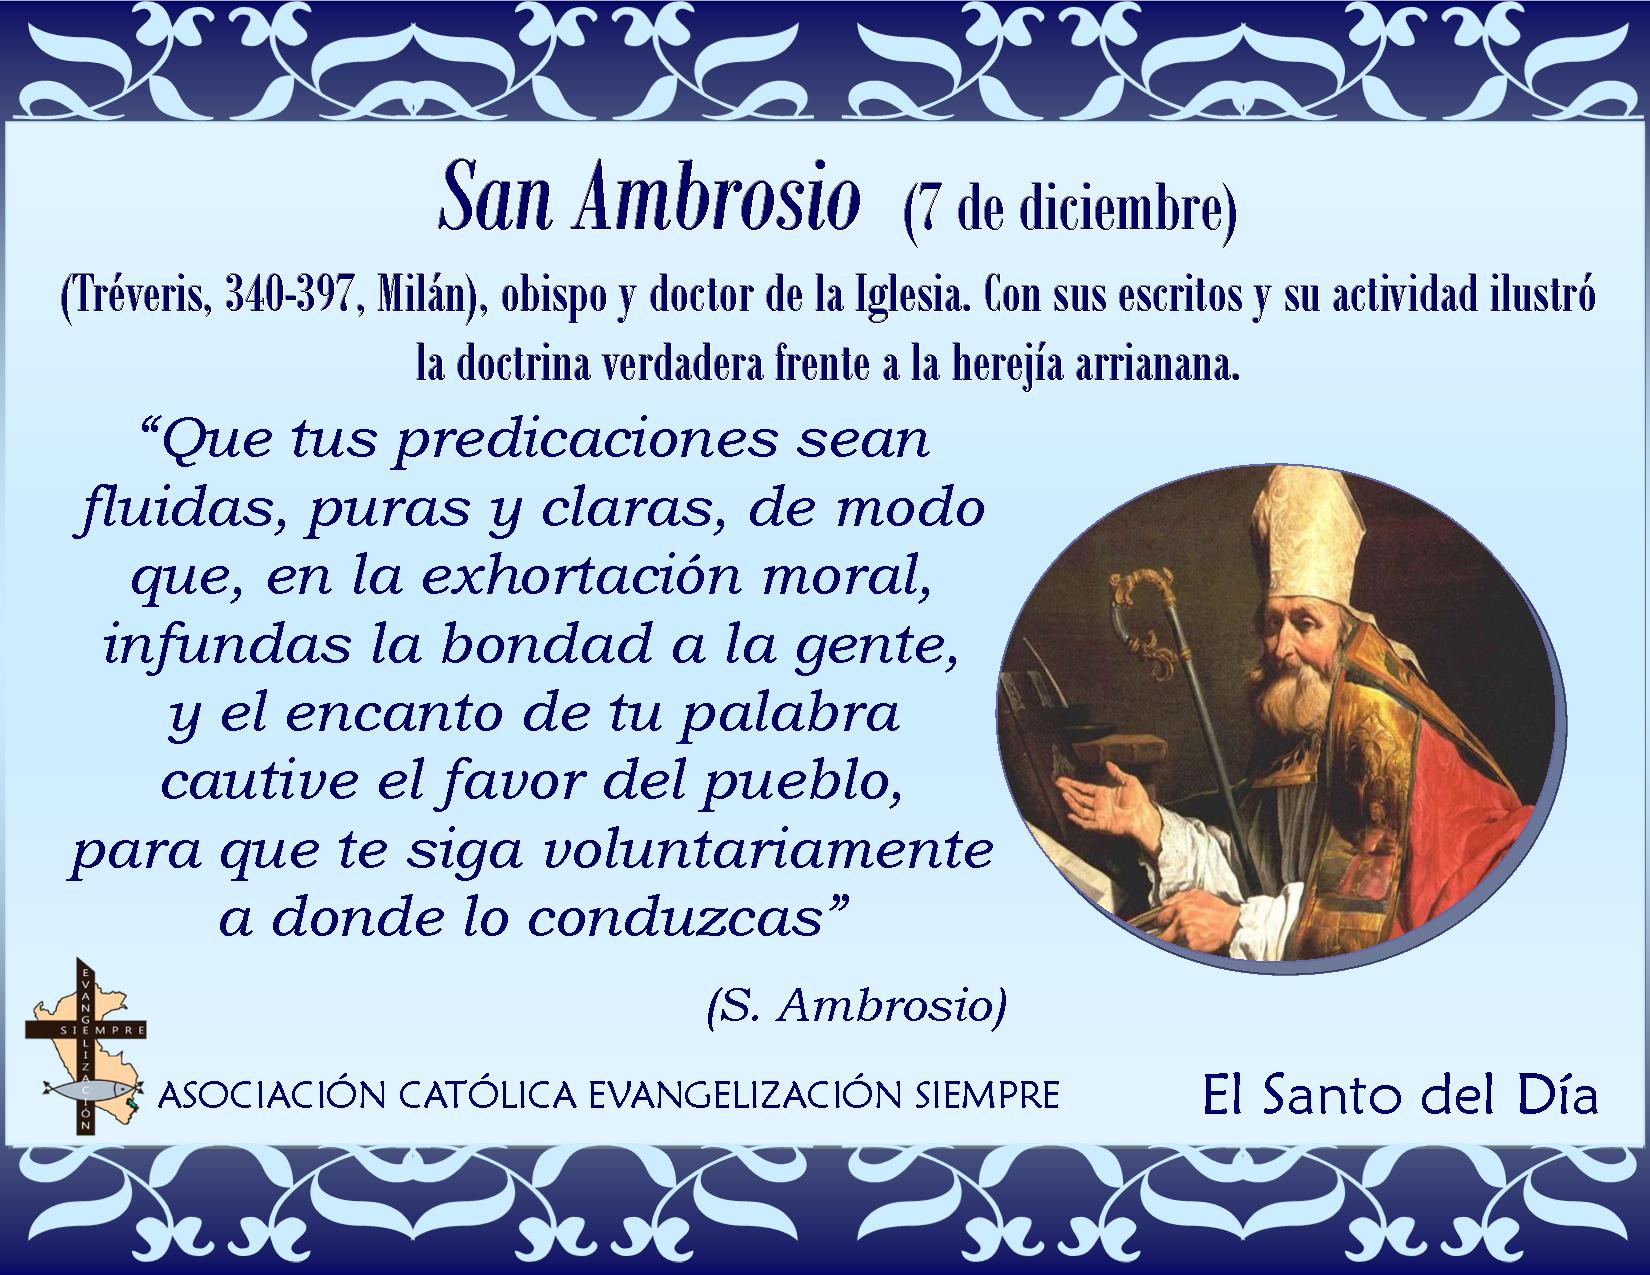 santo-del-dia-7-diciembre